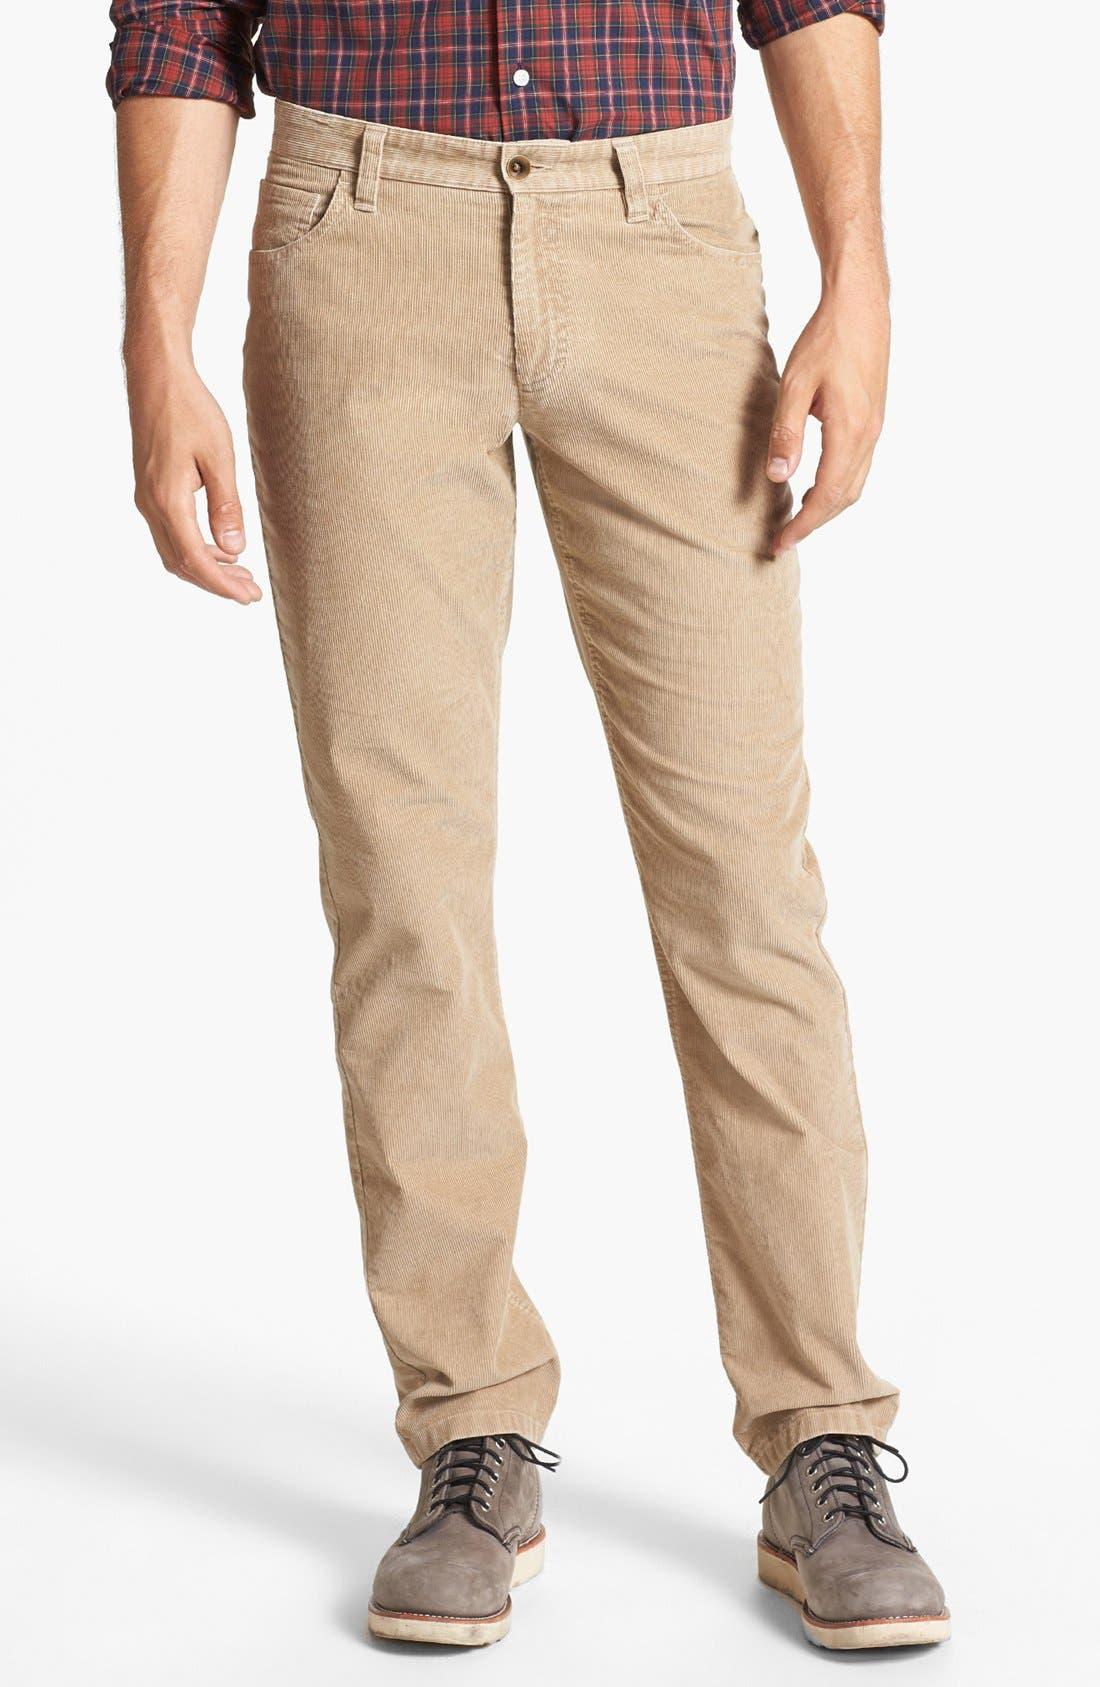 Alternate Image 1 Selected - Wallin & Bros. Corduroy Pants